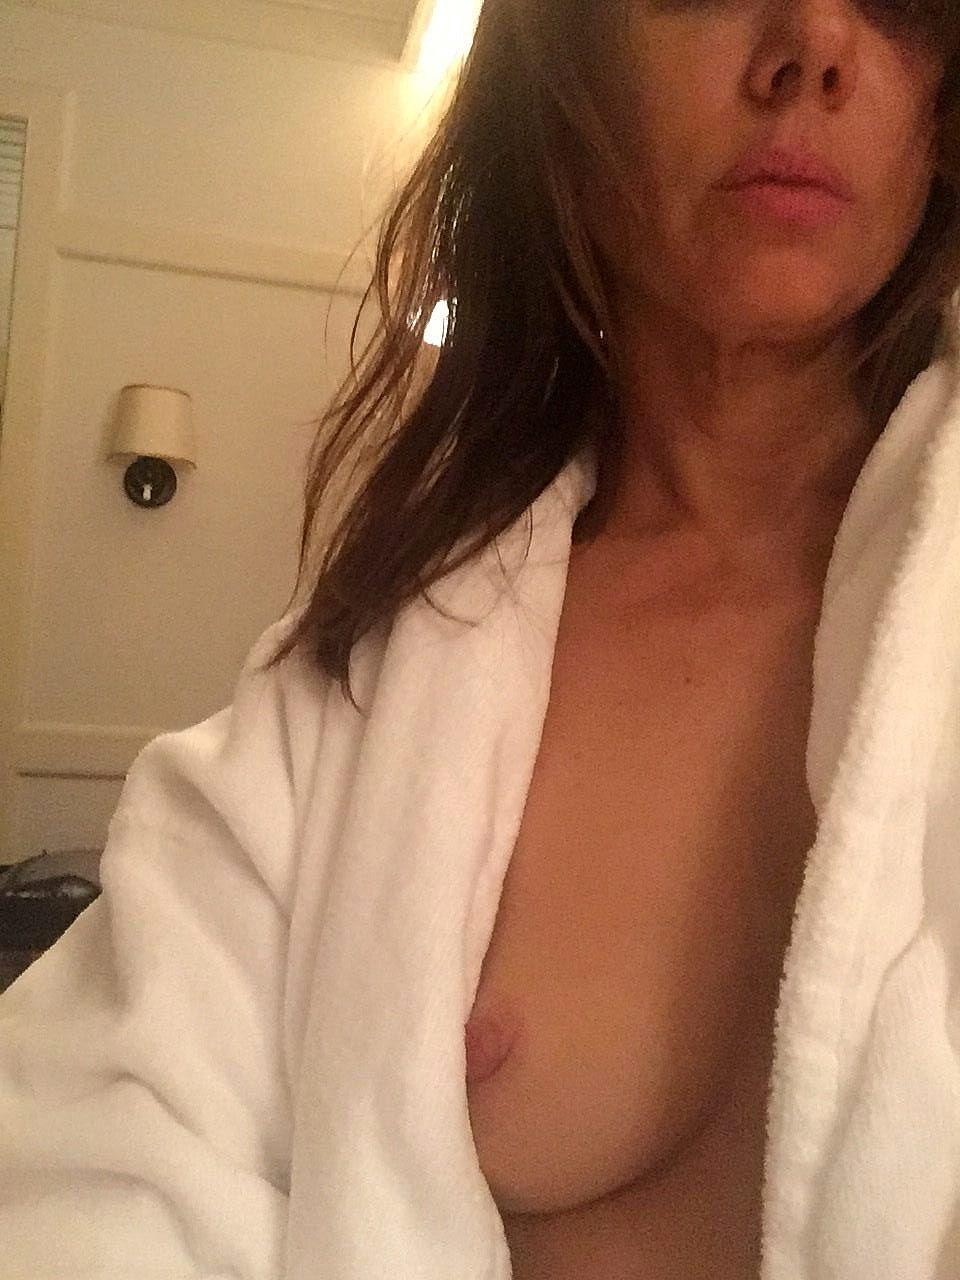 nude (14 photo), Is a cute Celebrites foto